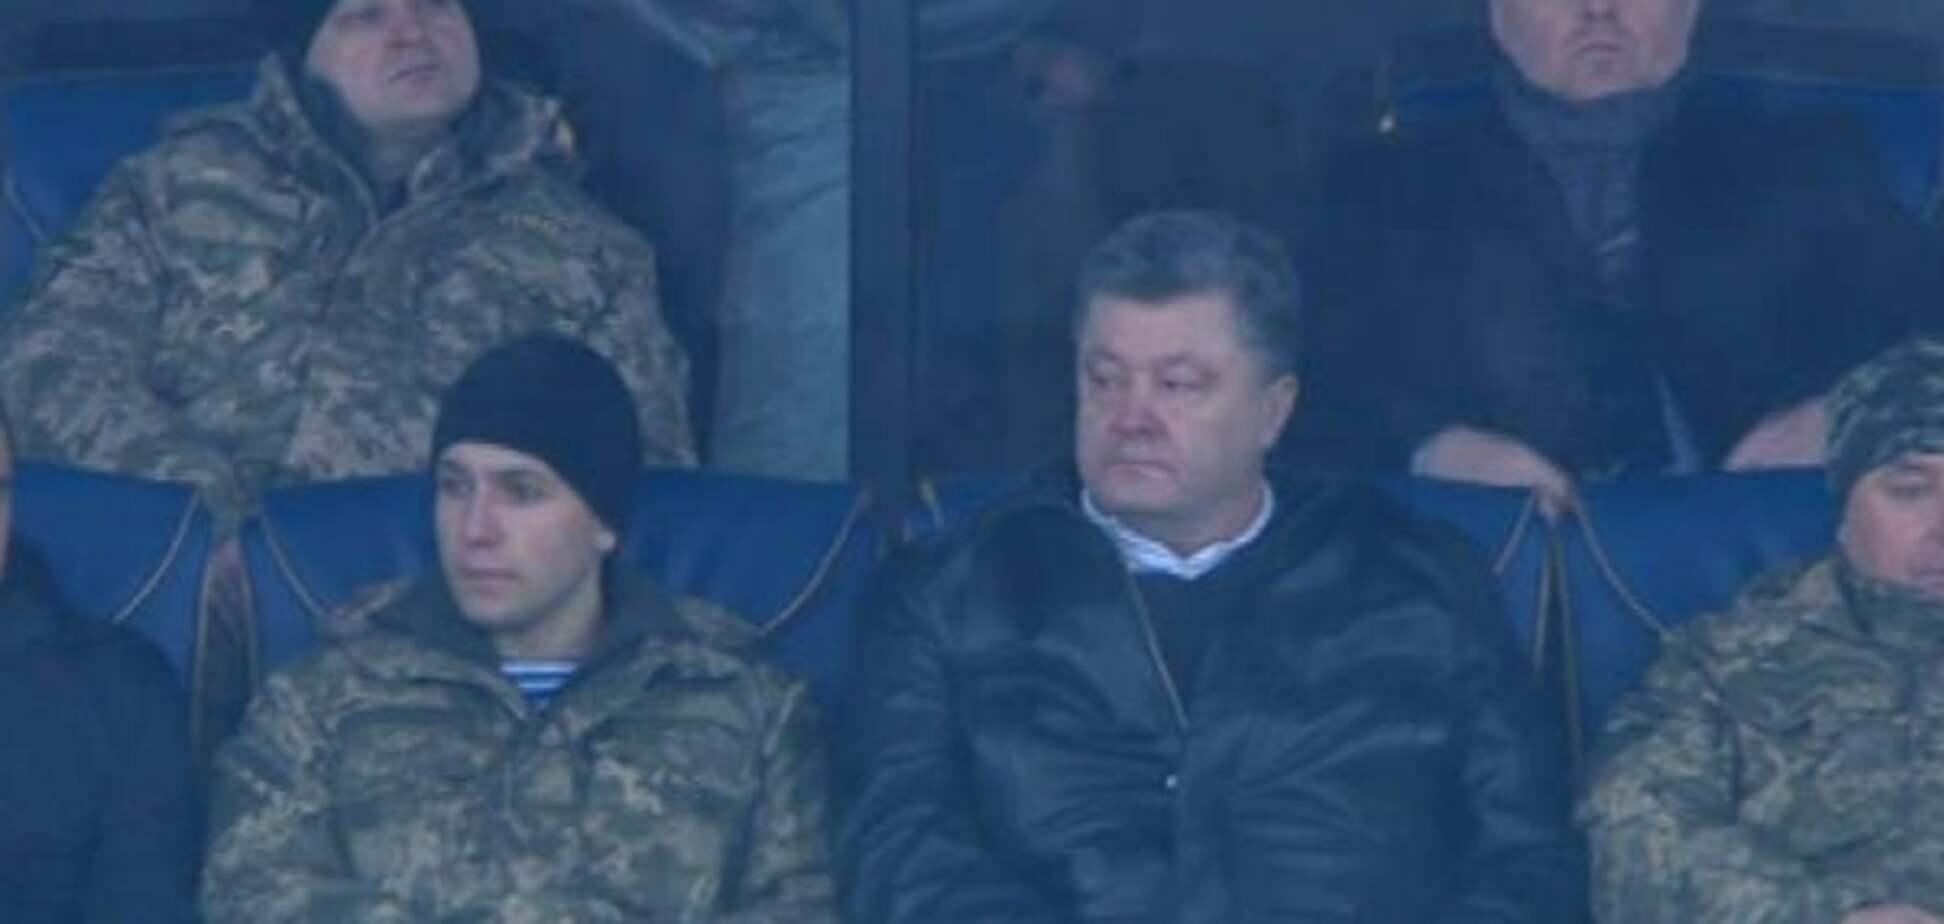 Порошенко с бойцами АТО посетил матч 'Динамо' - 'Манчестер Сити': фотофакт